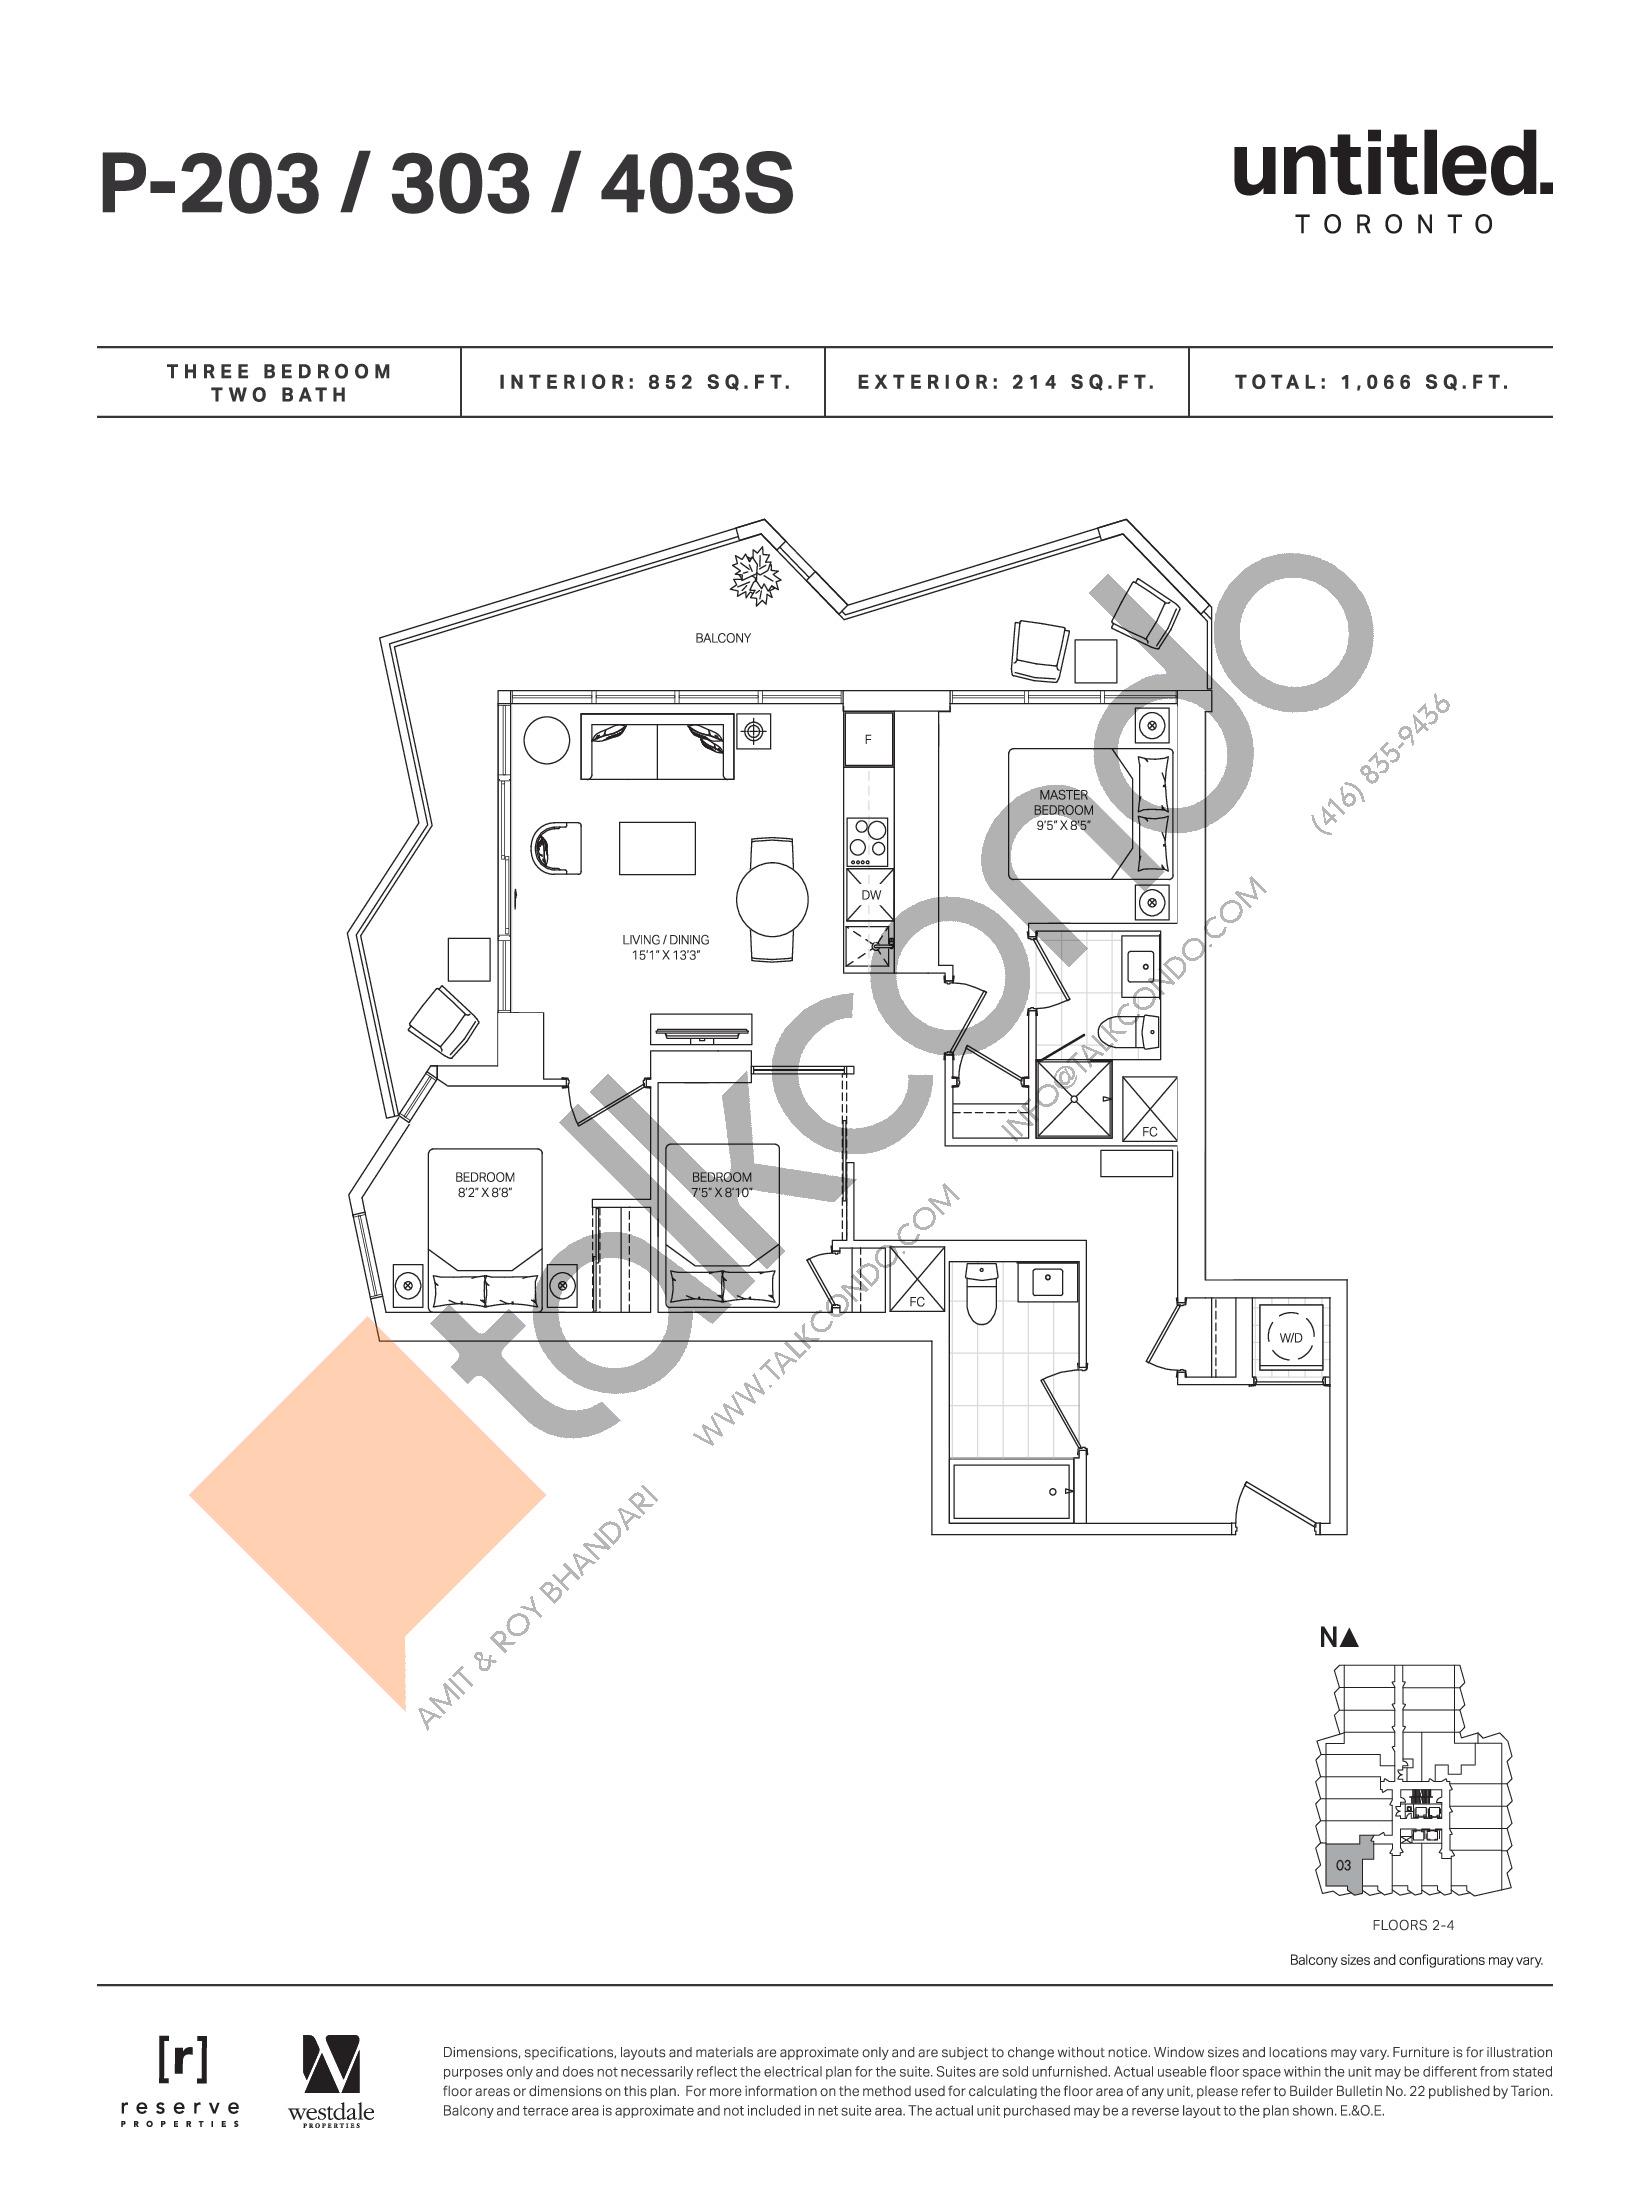 P-203 / 303 / 403S Floor Plan at Untitled Toronto Condos - 852 sq.ft